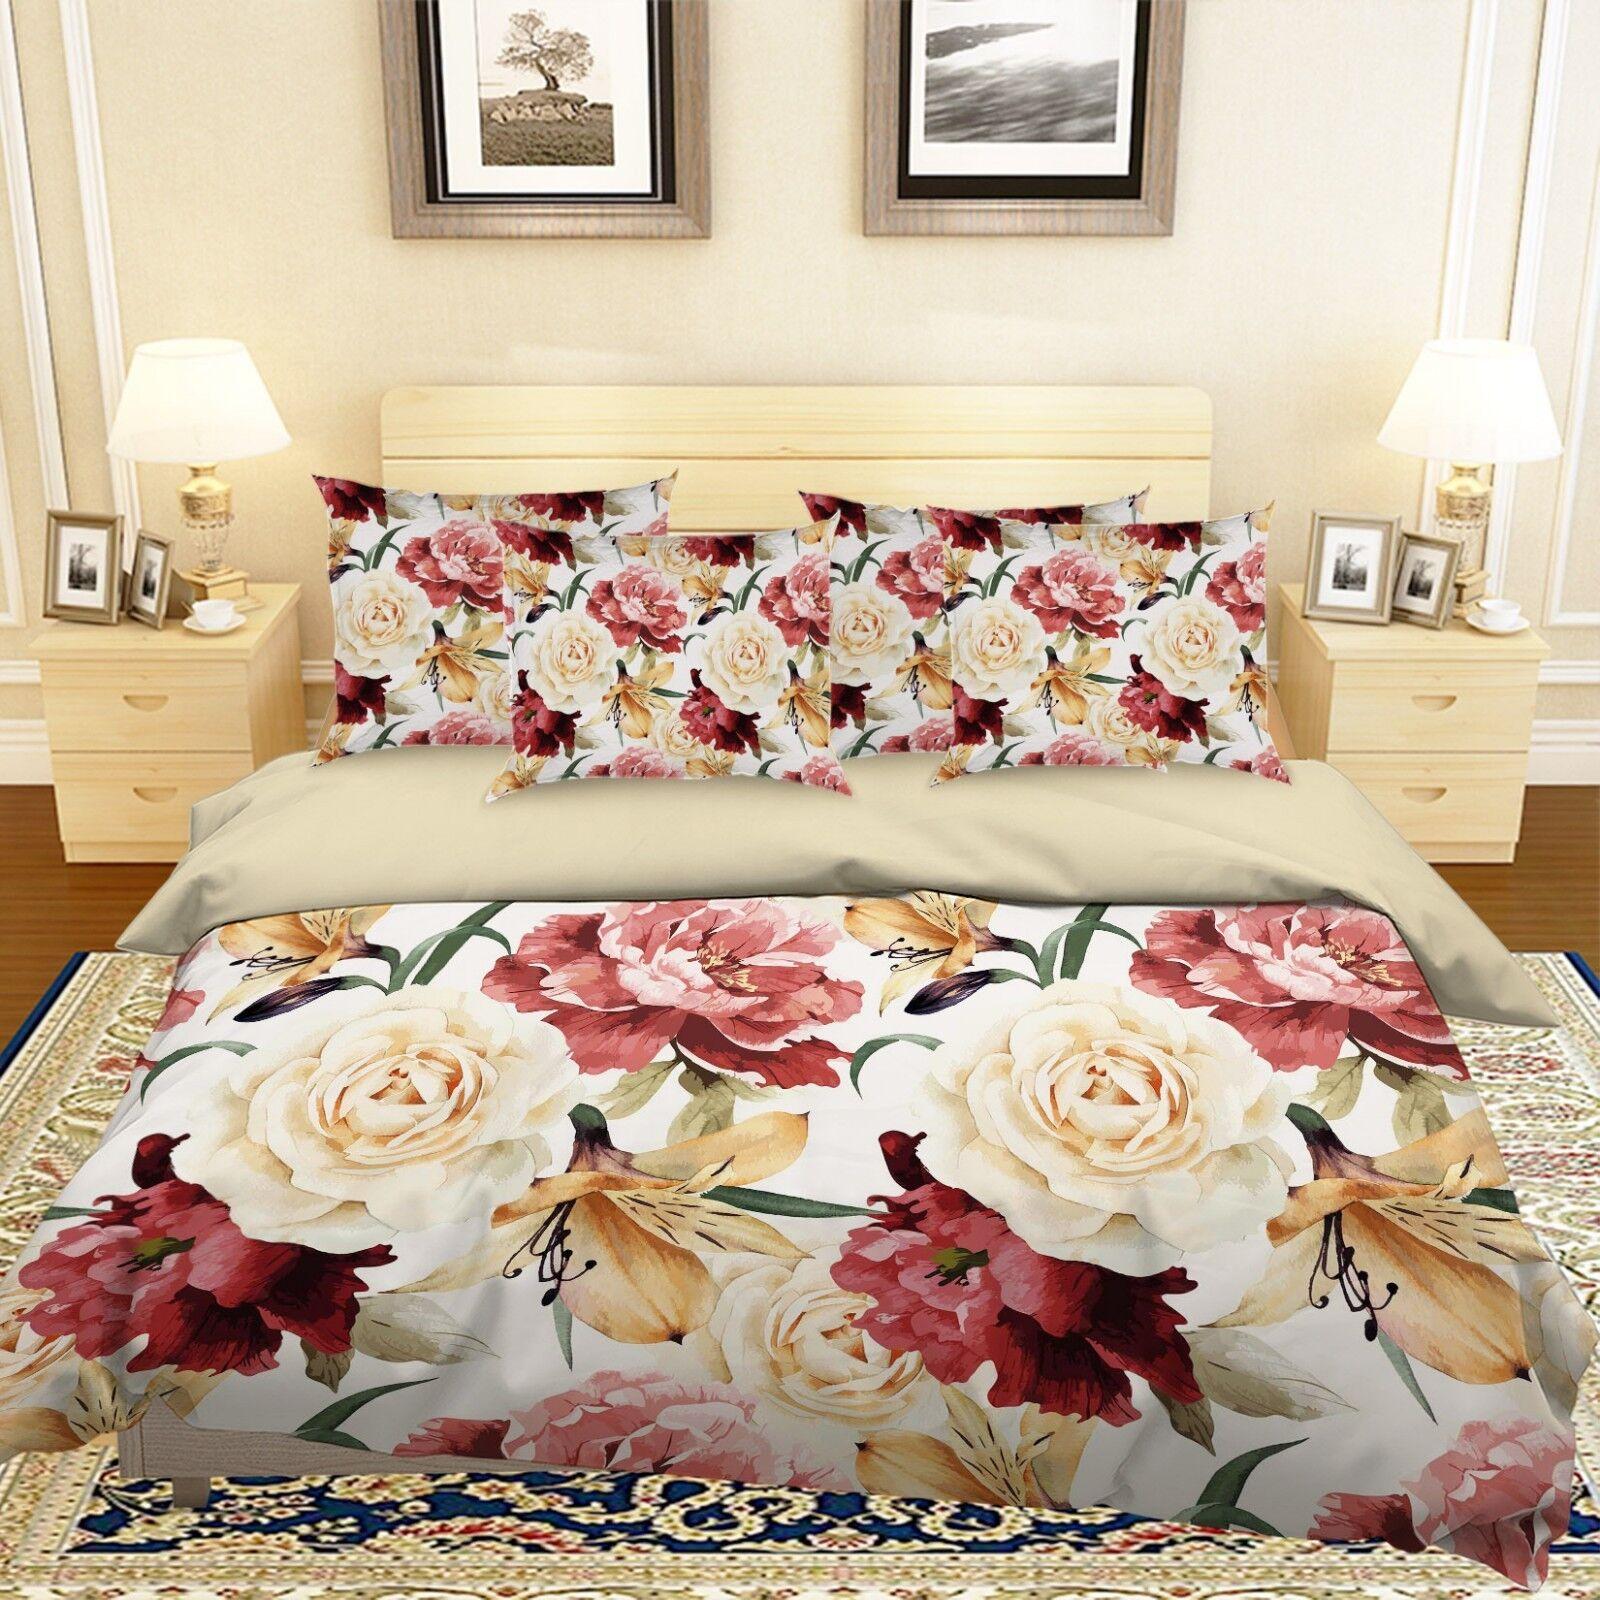 3D Natural pink 637 Bed Pillowcases Quilt Duvet Cover Set Single King UK Summer